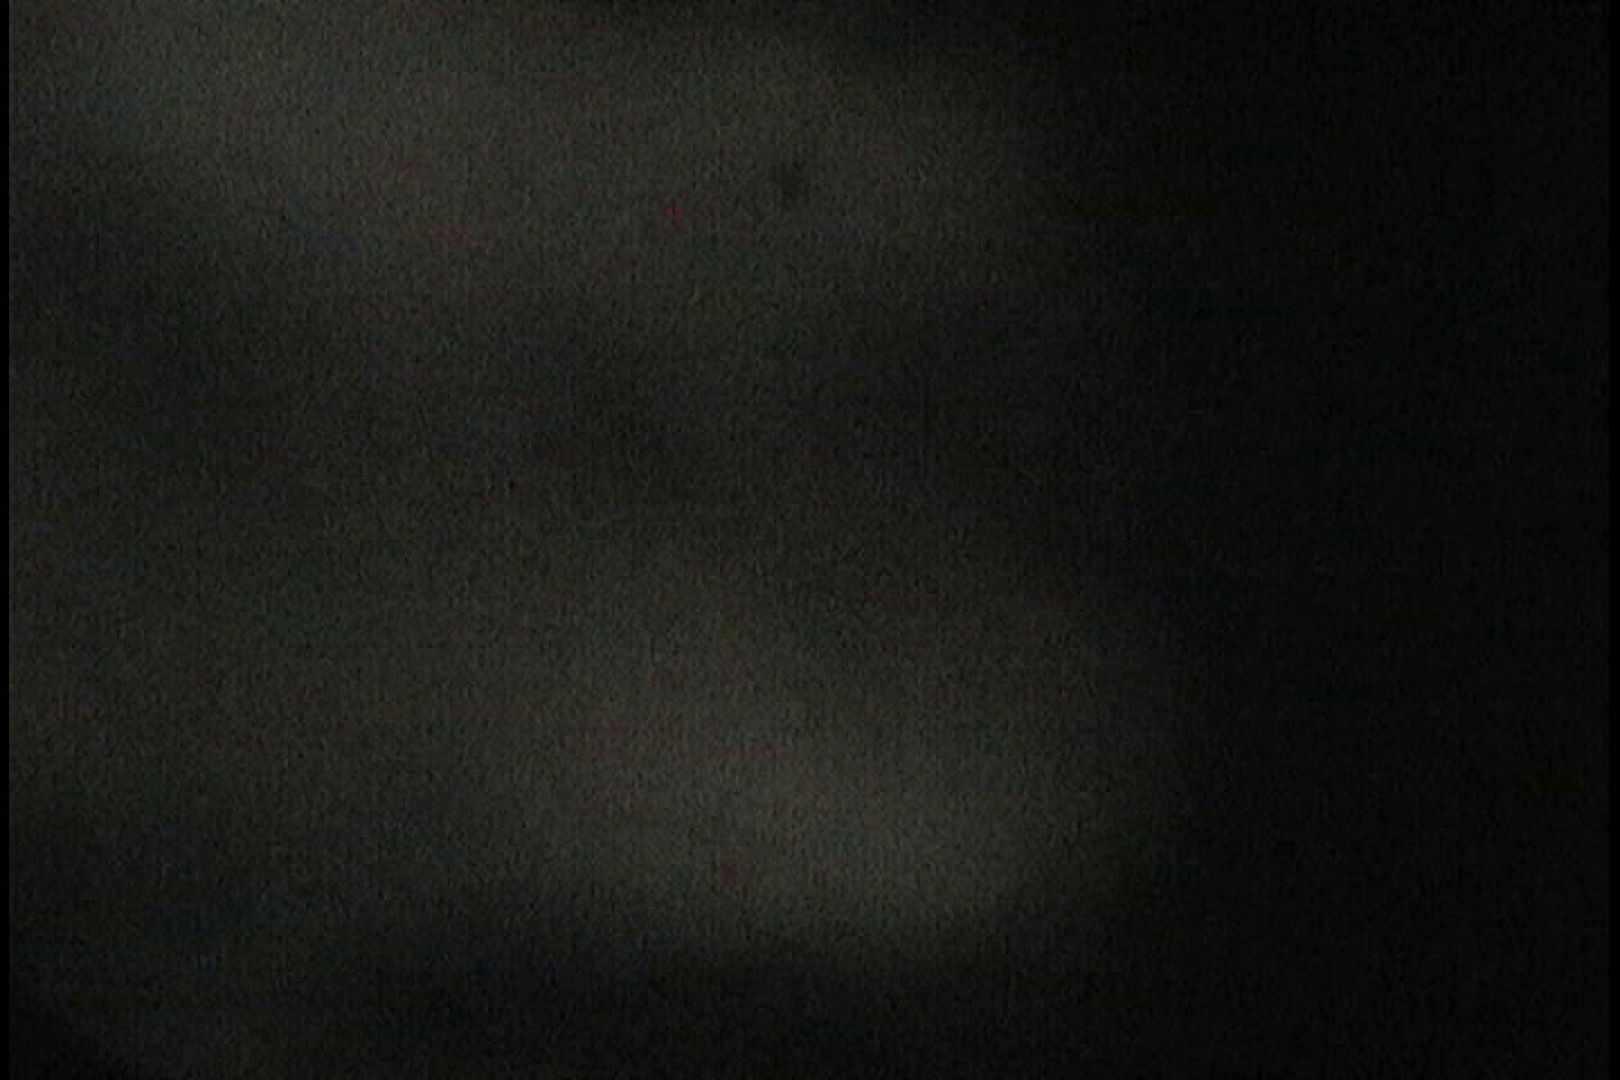 No.68 見事に可愛い巨乳ちゃん 室内暗いです 桃色乳首 性交動画流出 41画像 27